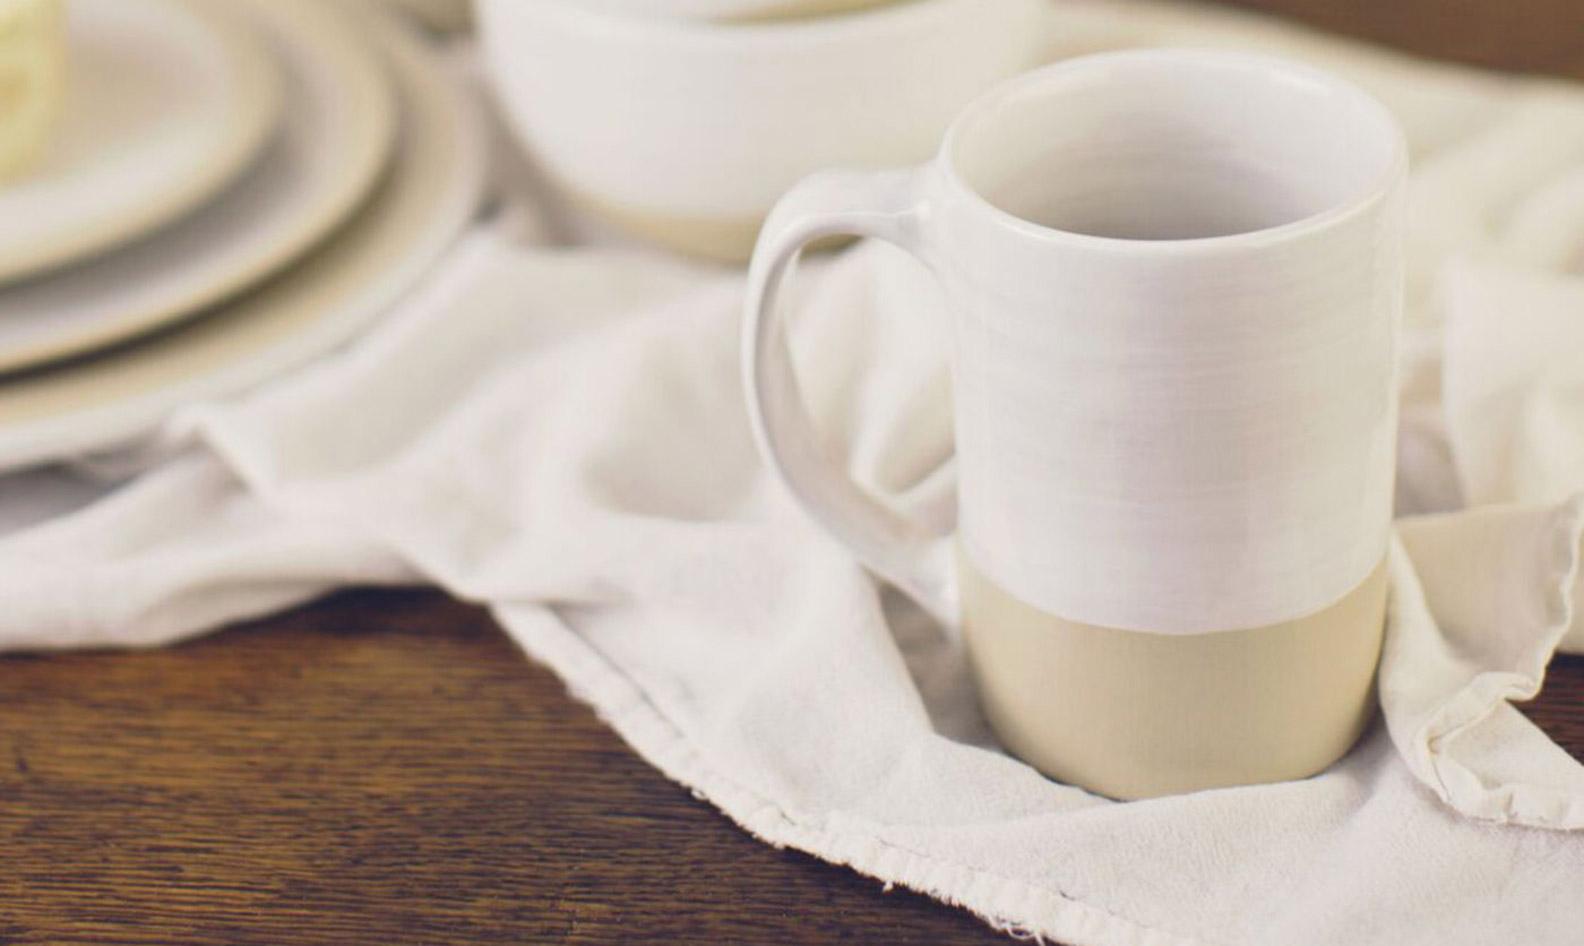 Stoneware & Co. 14-ounce Mug